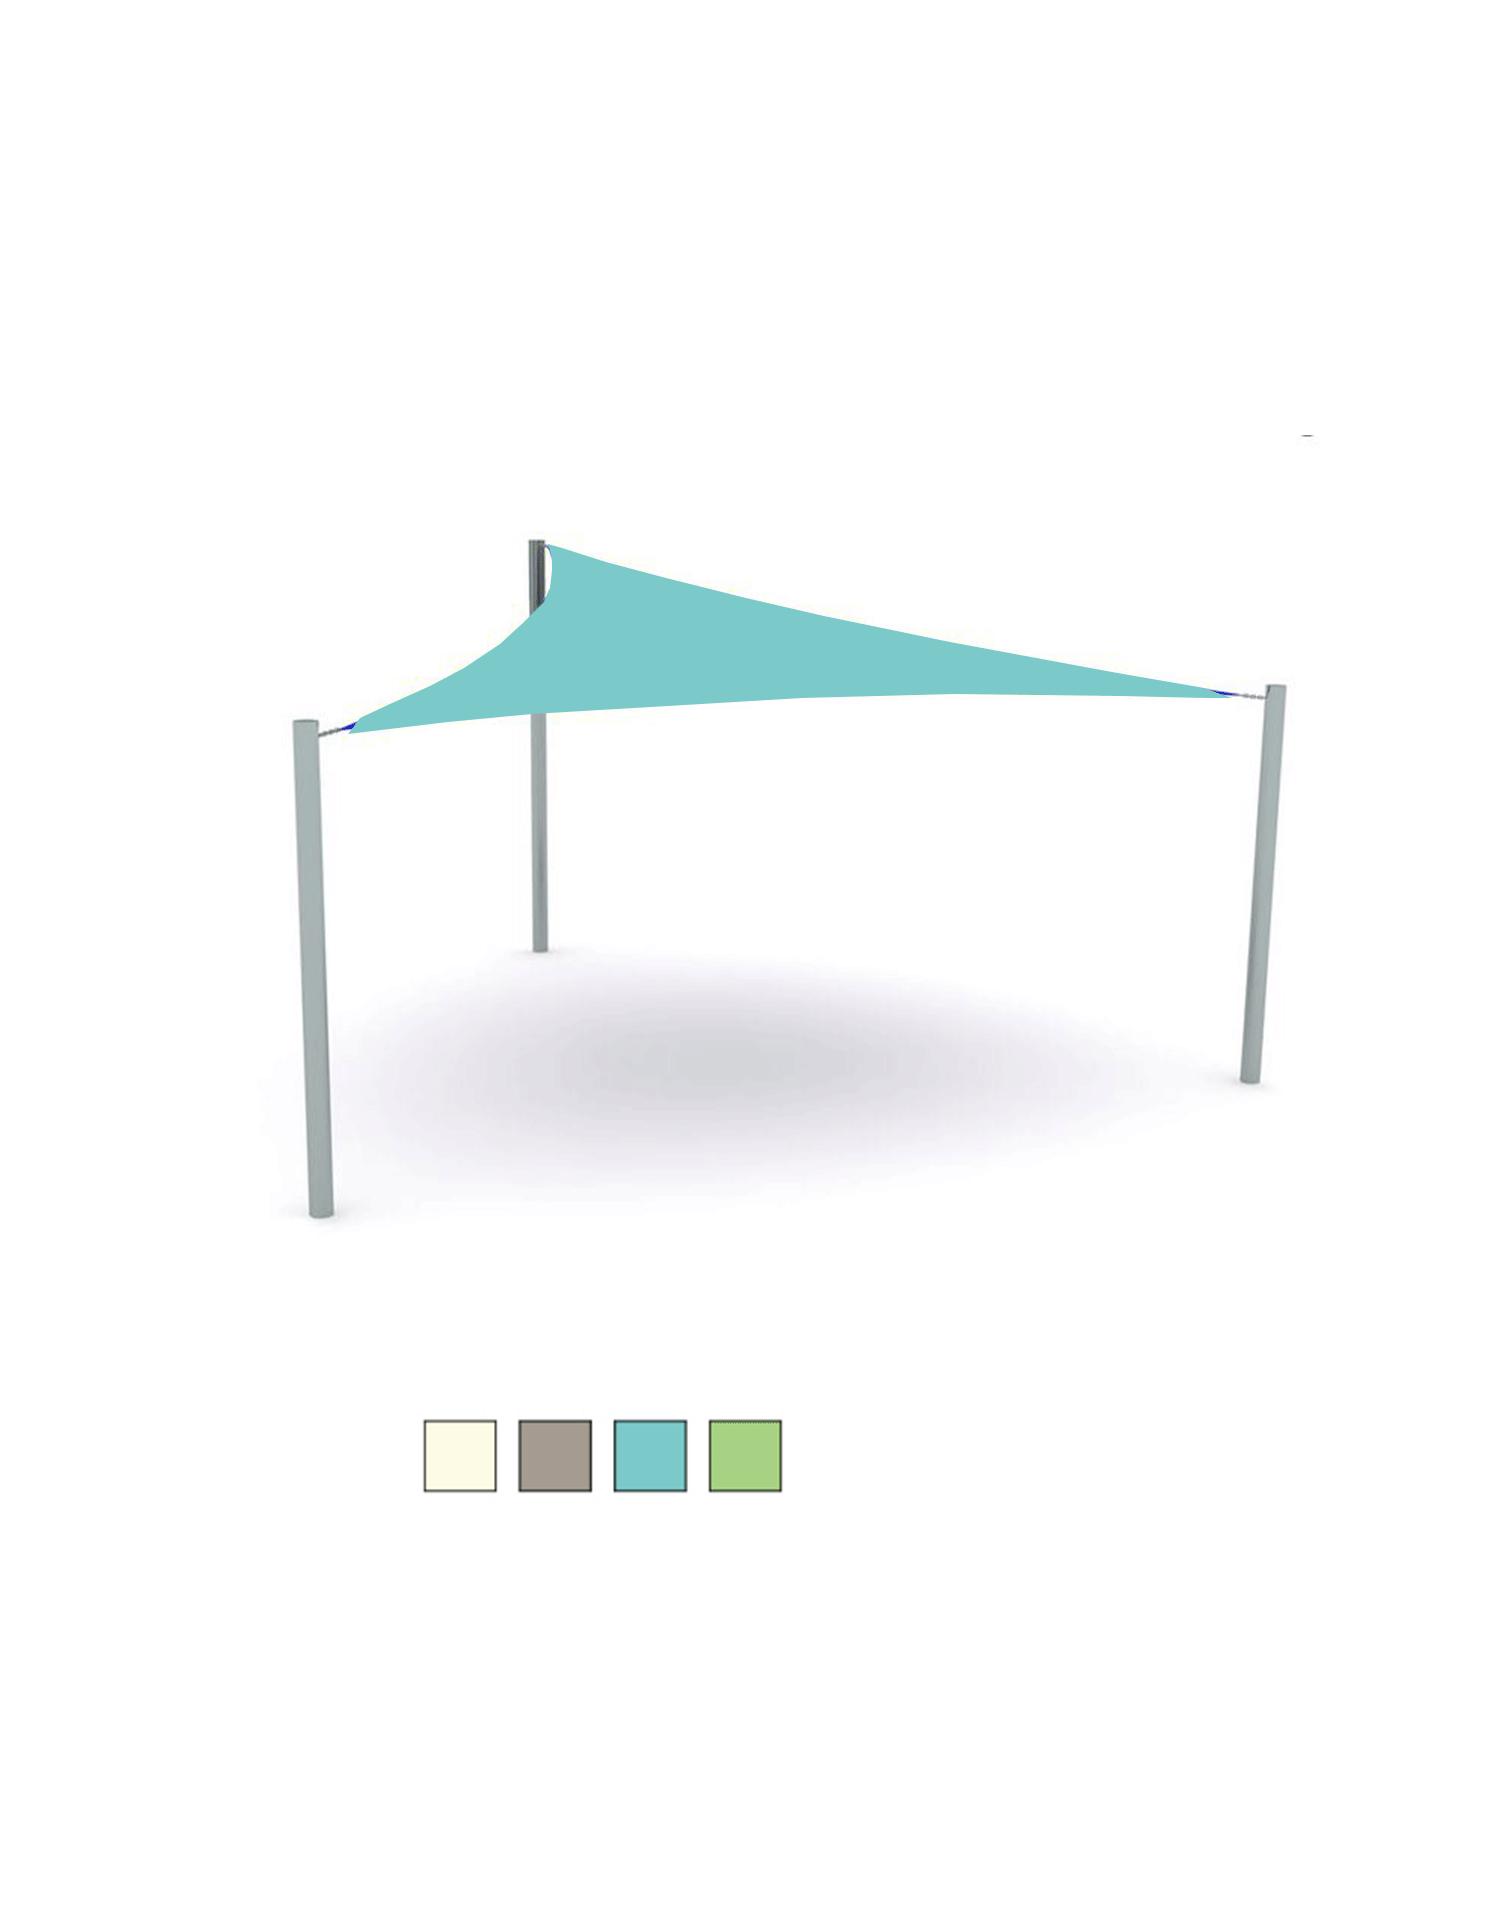 sonnensegel dreieckig blau. Black Bedroom Furniture Sets. Home Design Ideas